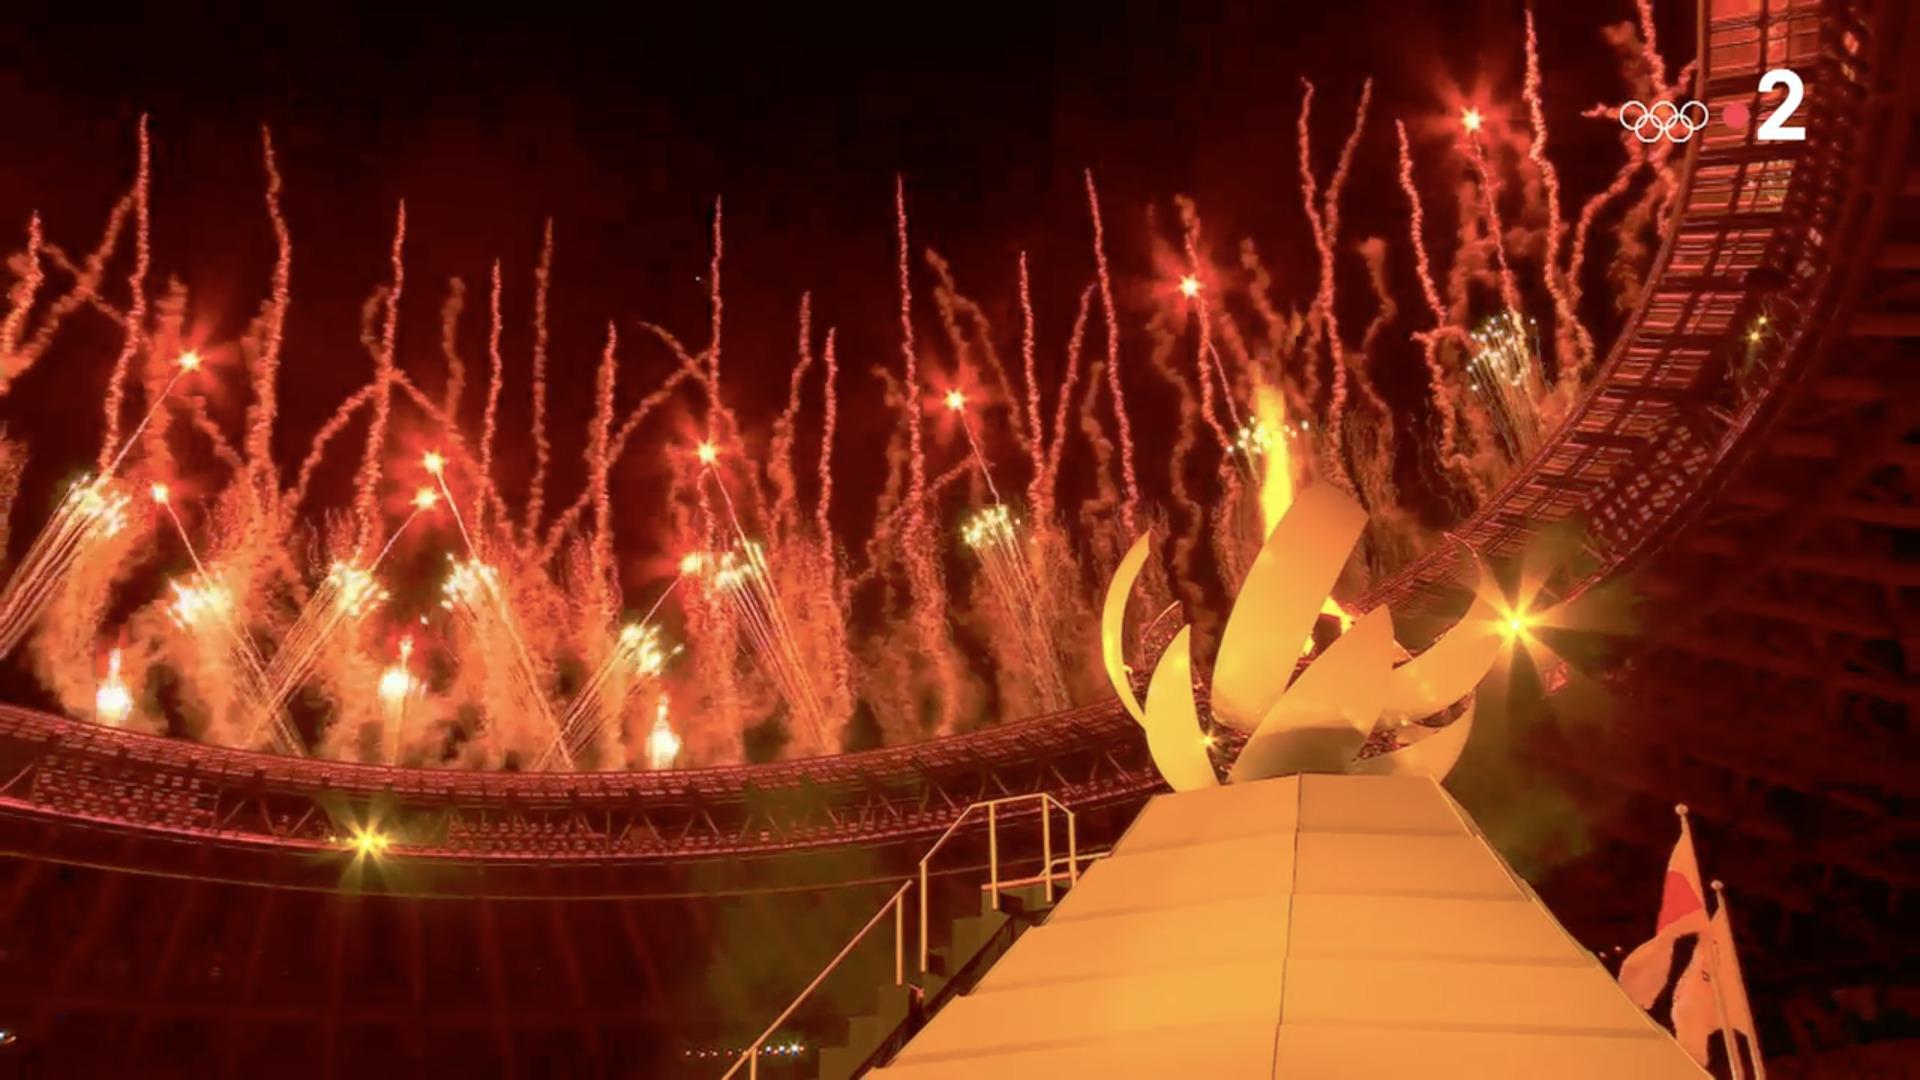 Flamme olympique, Tokyo, 23 juillet 2021, capture Zenit / France 2